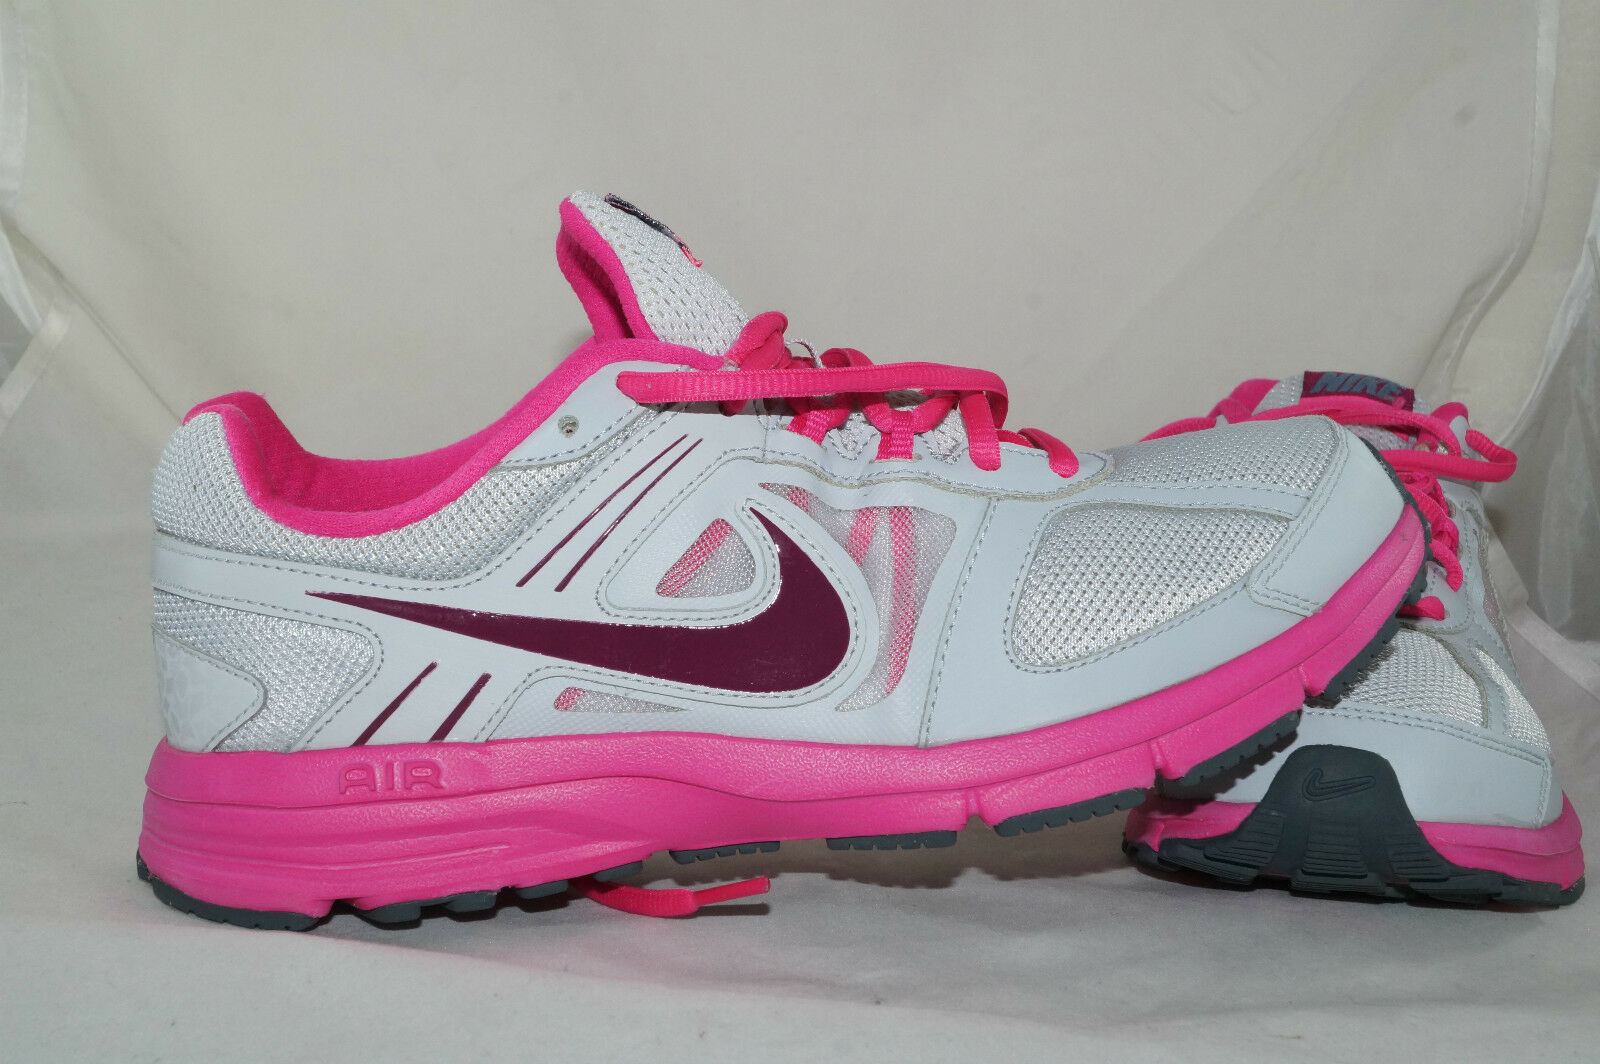 Nike Air Relentless running 40,5 3 GR: 40,5 running rosa running Relentless 877bf6